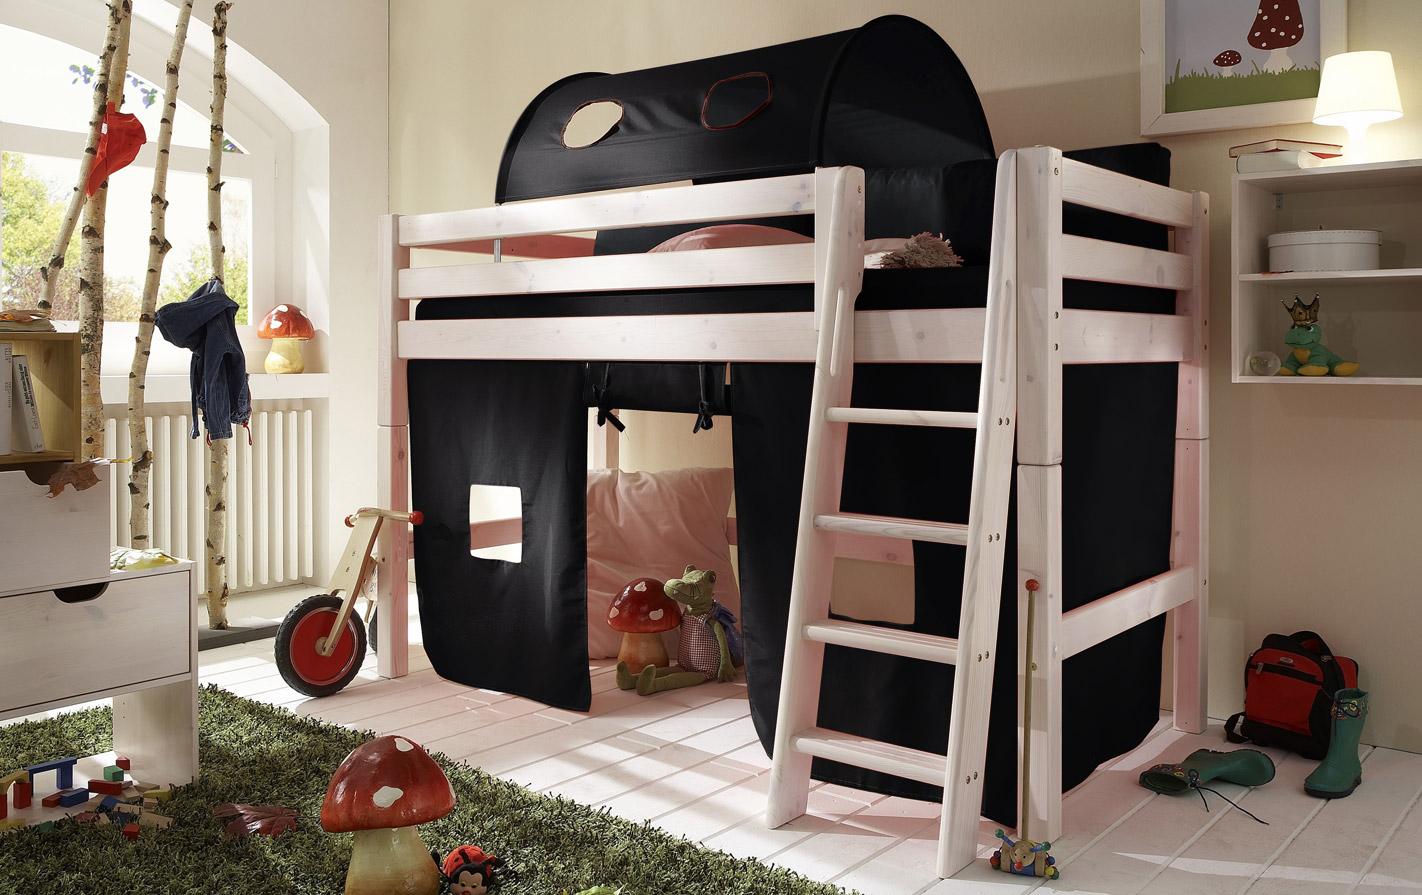 Schwarzer Spielvorhang Mini-Hochbett in unifarben